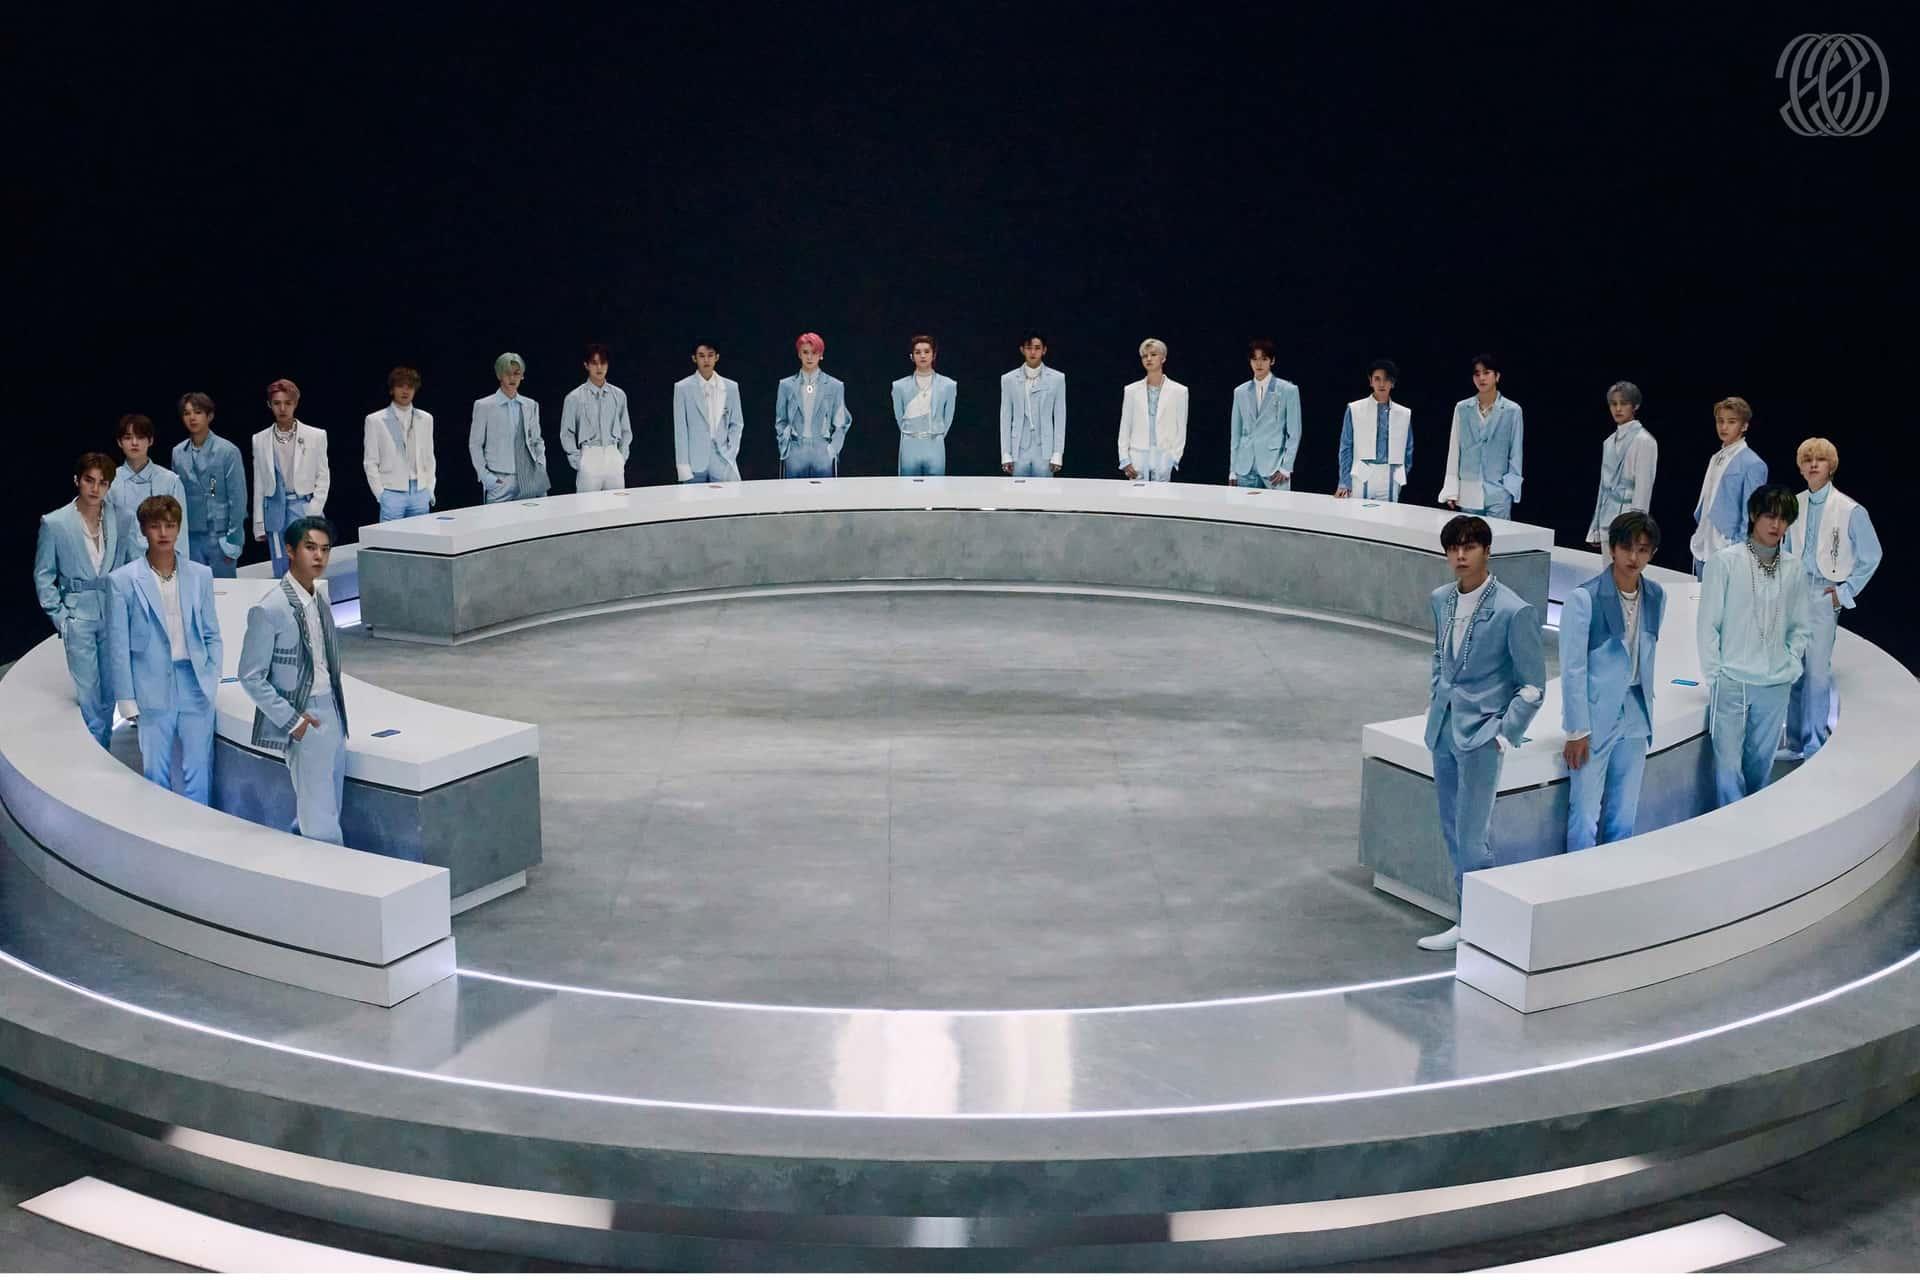 NCT – perfil, integrantes do grupo, idades, alturas, popularidades, fatos 2021